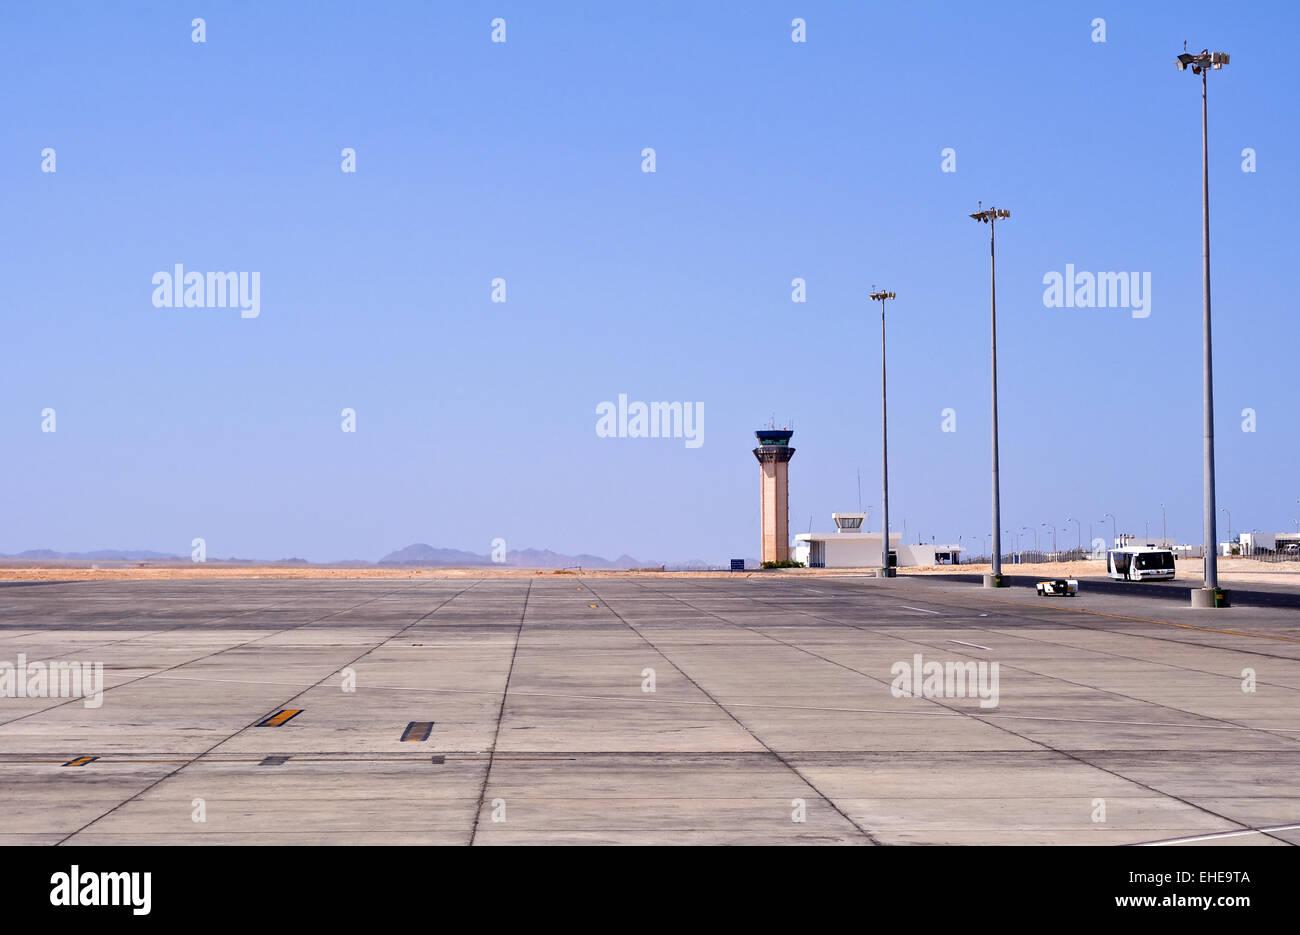 Flughafen Marsa Alam ägypten Stockfoto Bild 79605690 Alamy